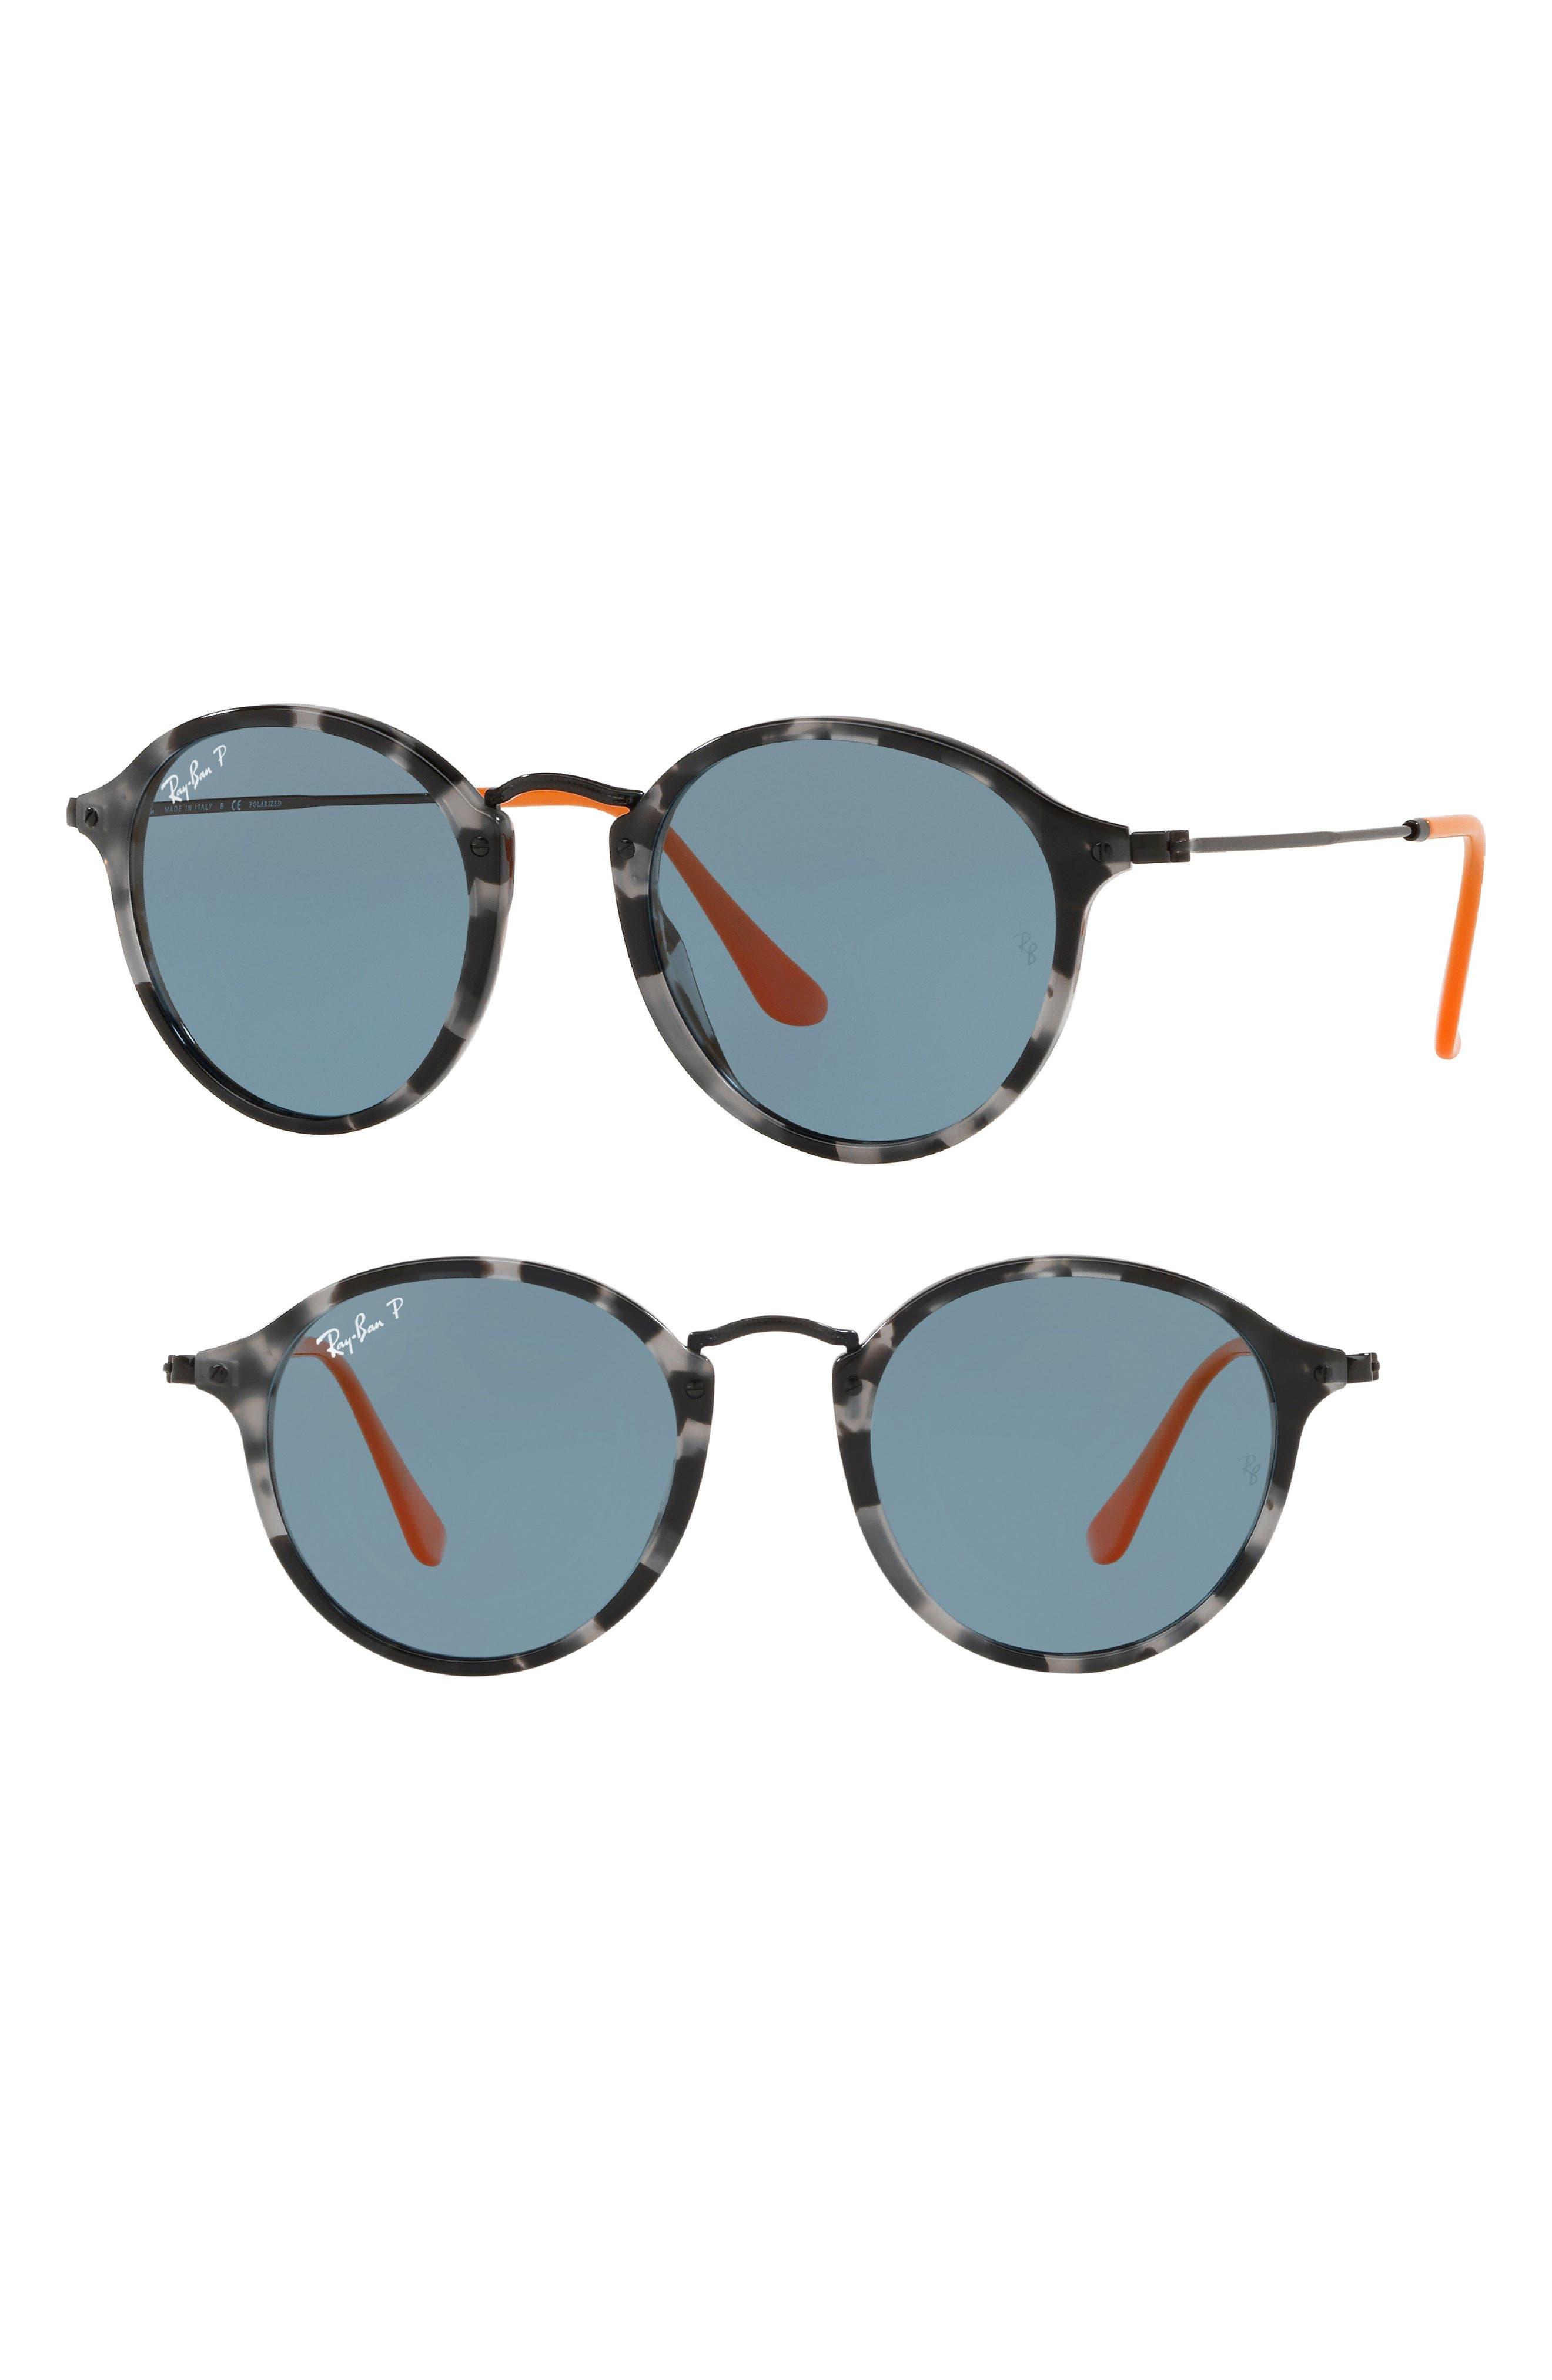 52mm Polarized Round Sunglasses,                         Main,                         color, 020